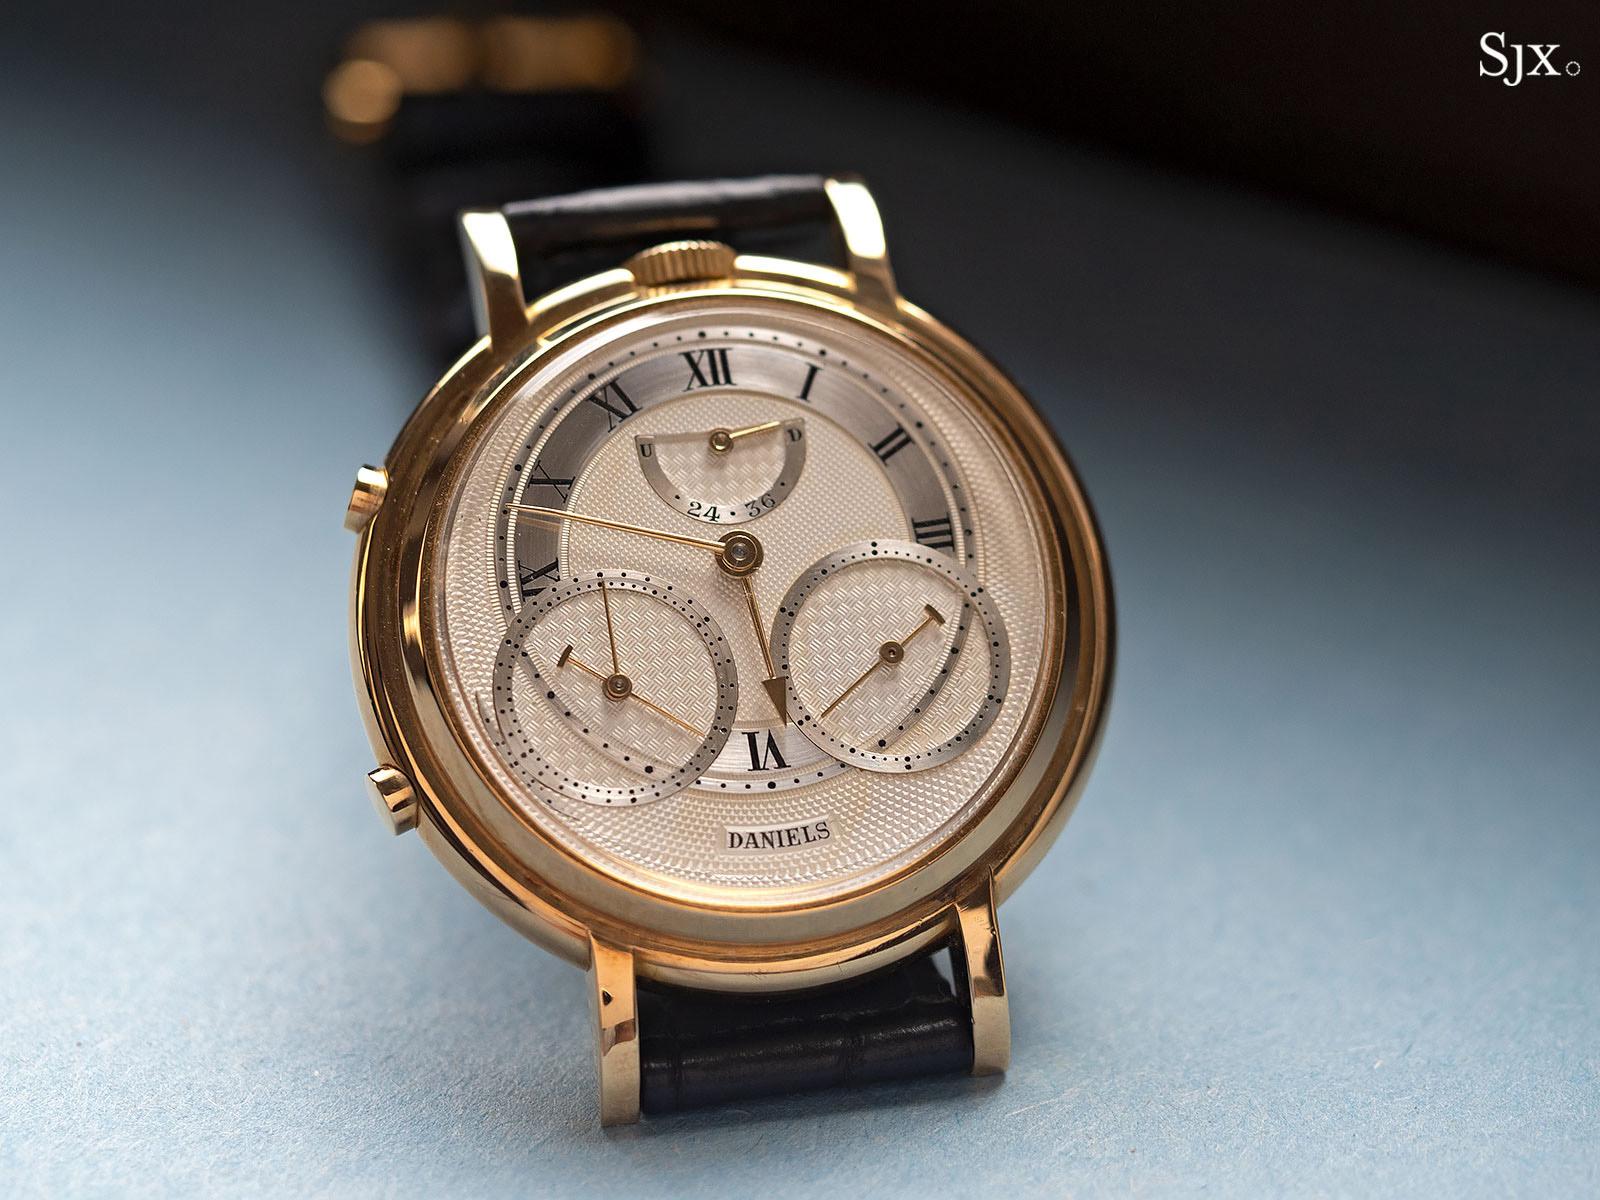 George Daniels Chronograph Wristwatch with tourbillon 6